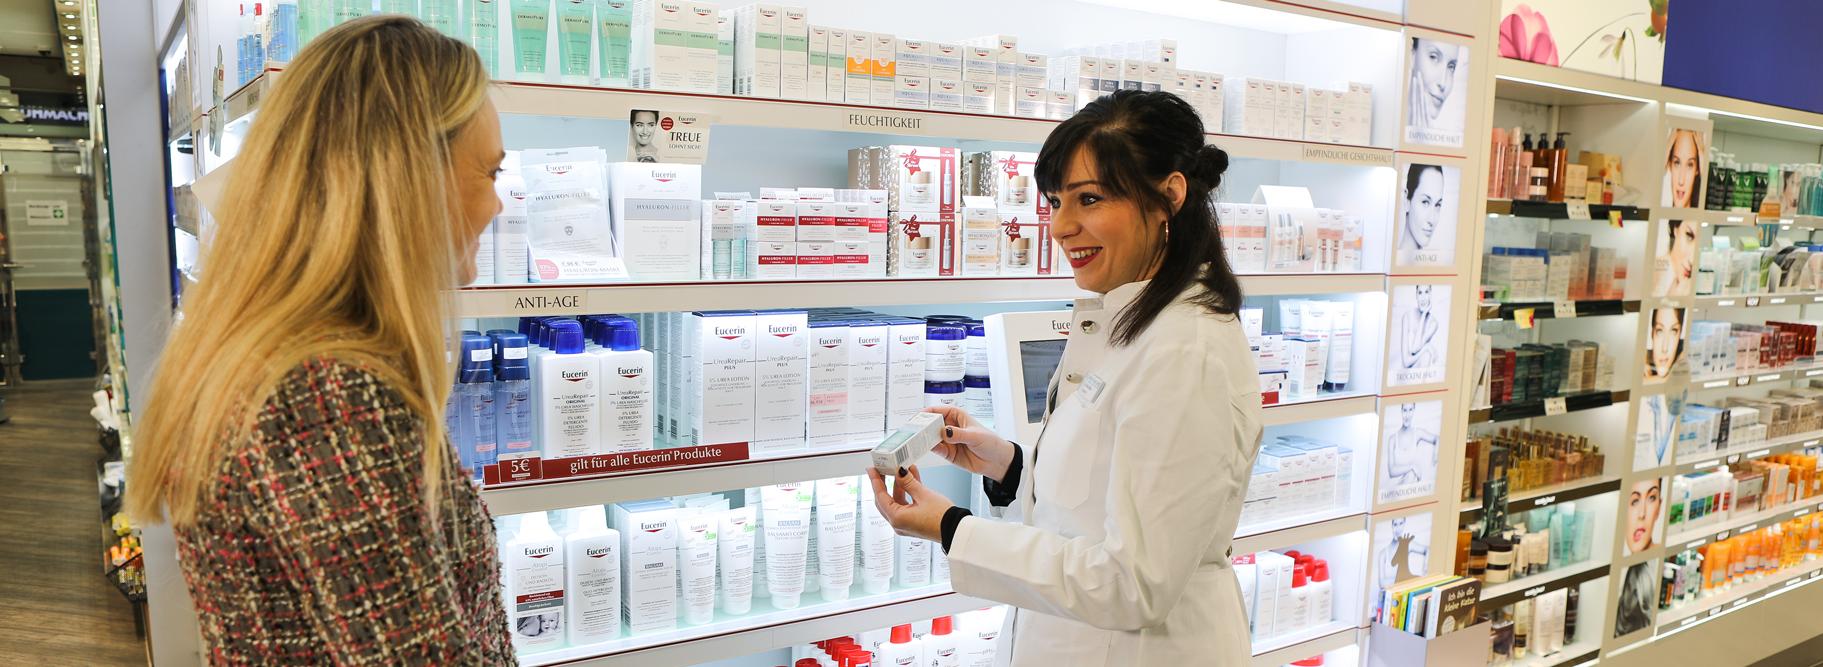 EEZ-Apotheke-Kosmetik-Gesichtspflege